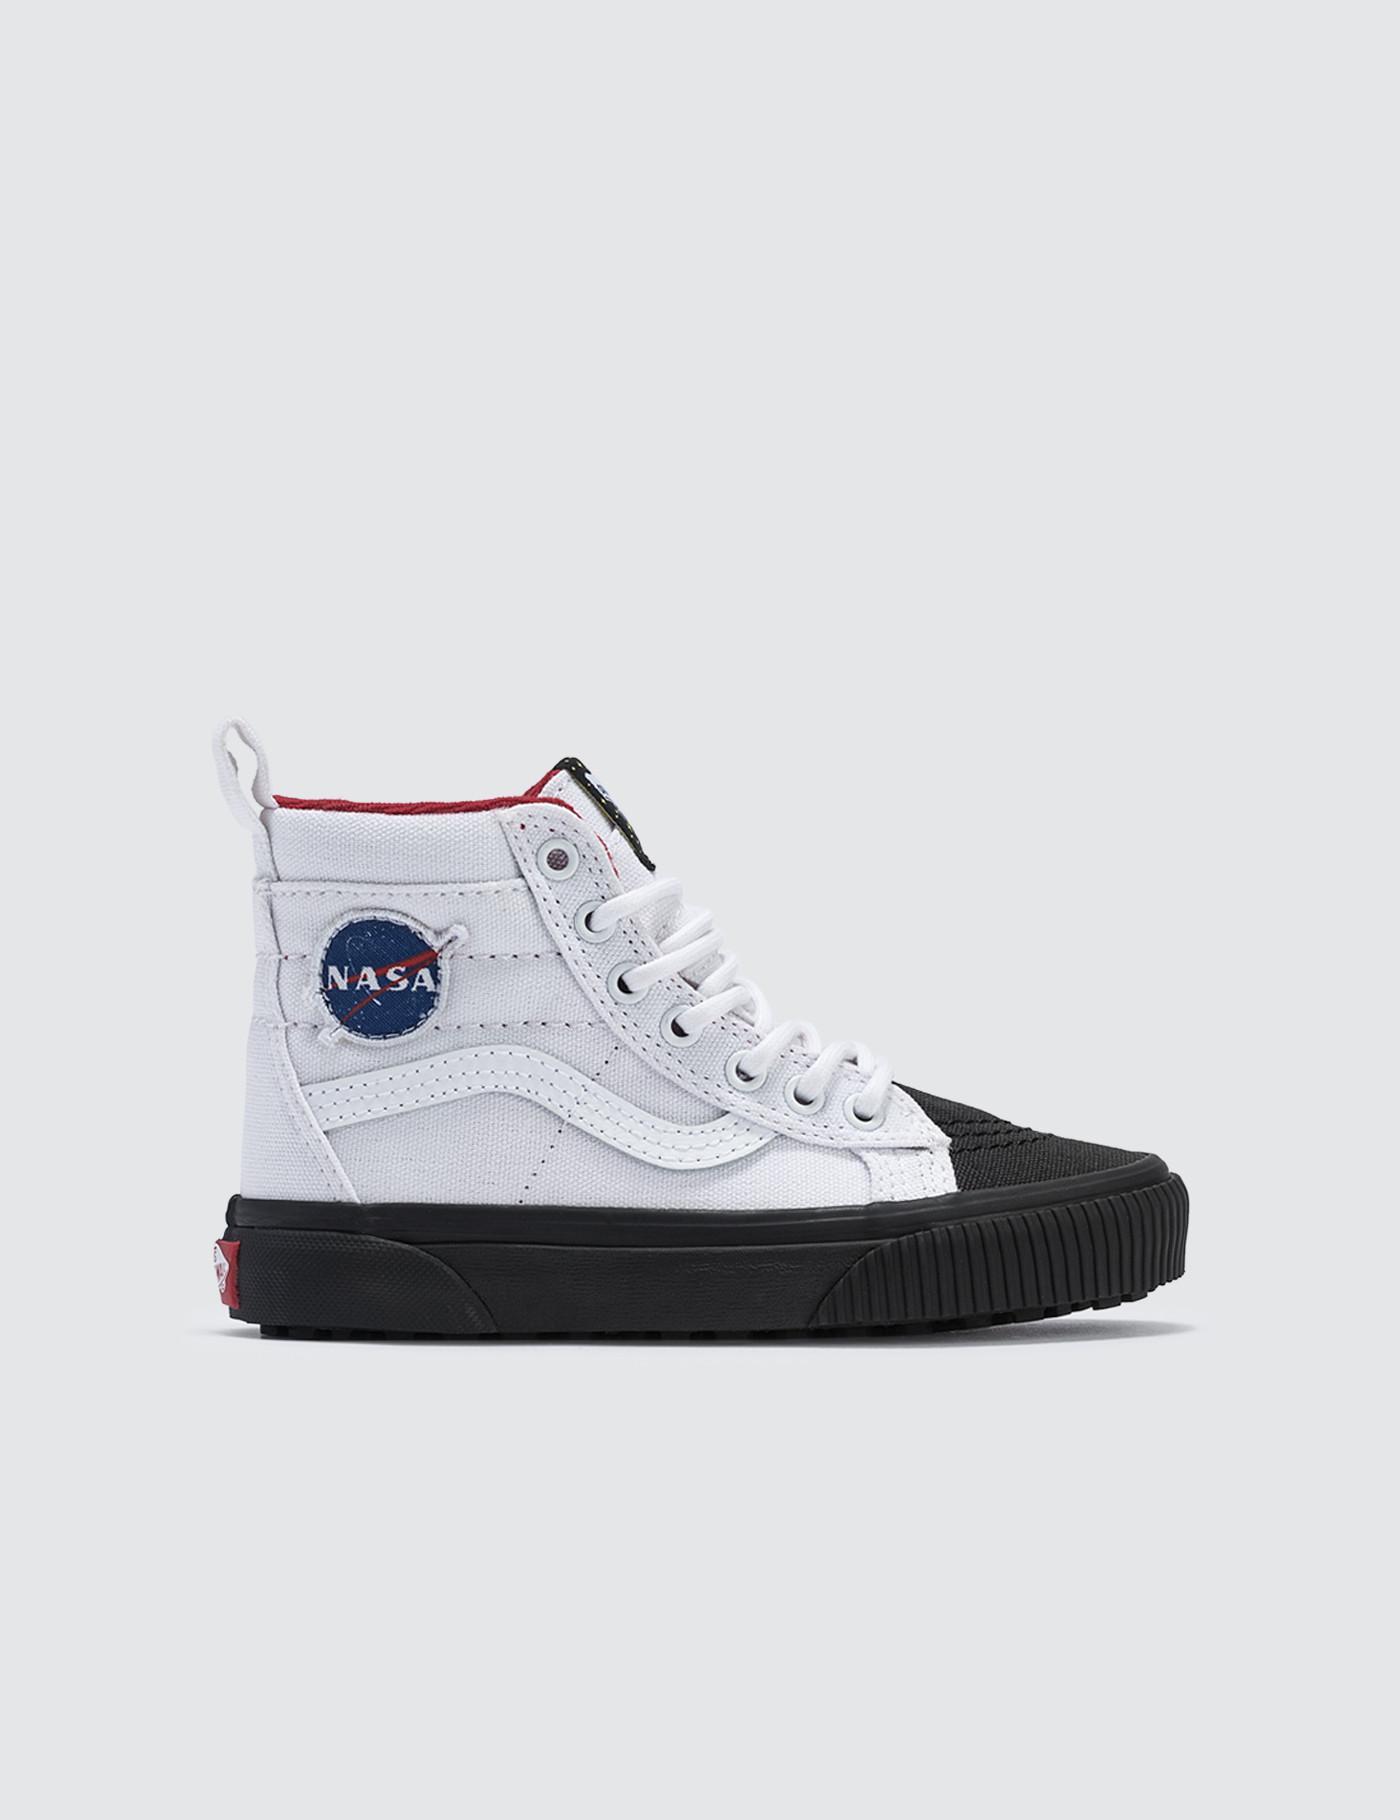 df678e1853 Vans Space Voyager Sk8-hi Mte Kids in White - Lyst